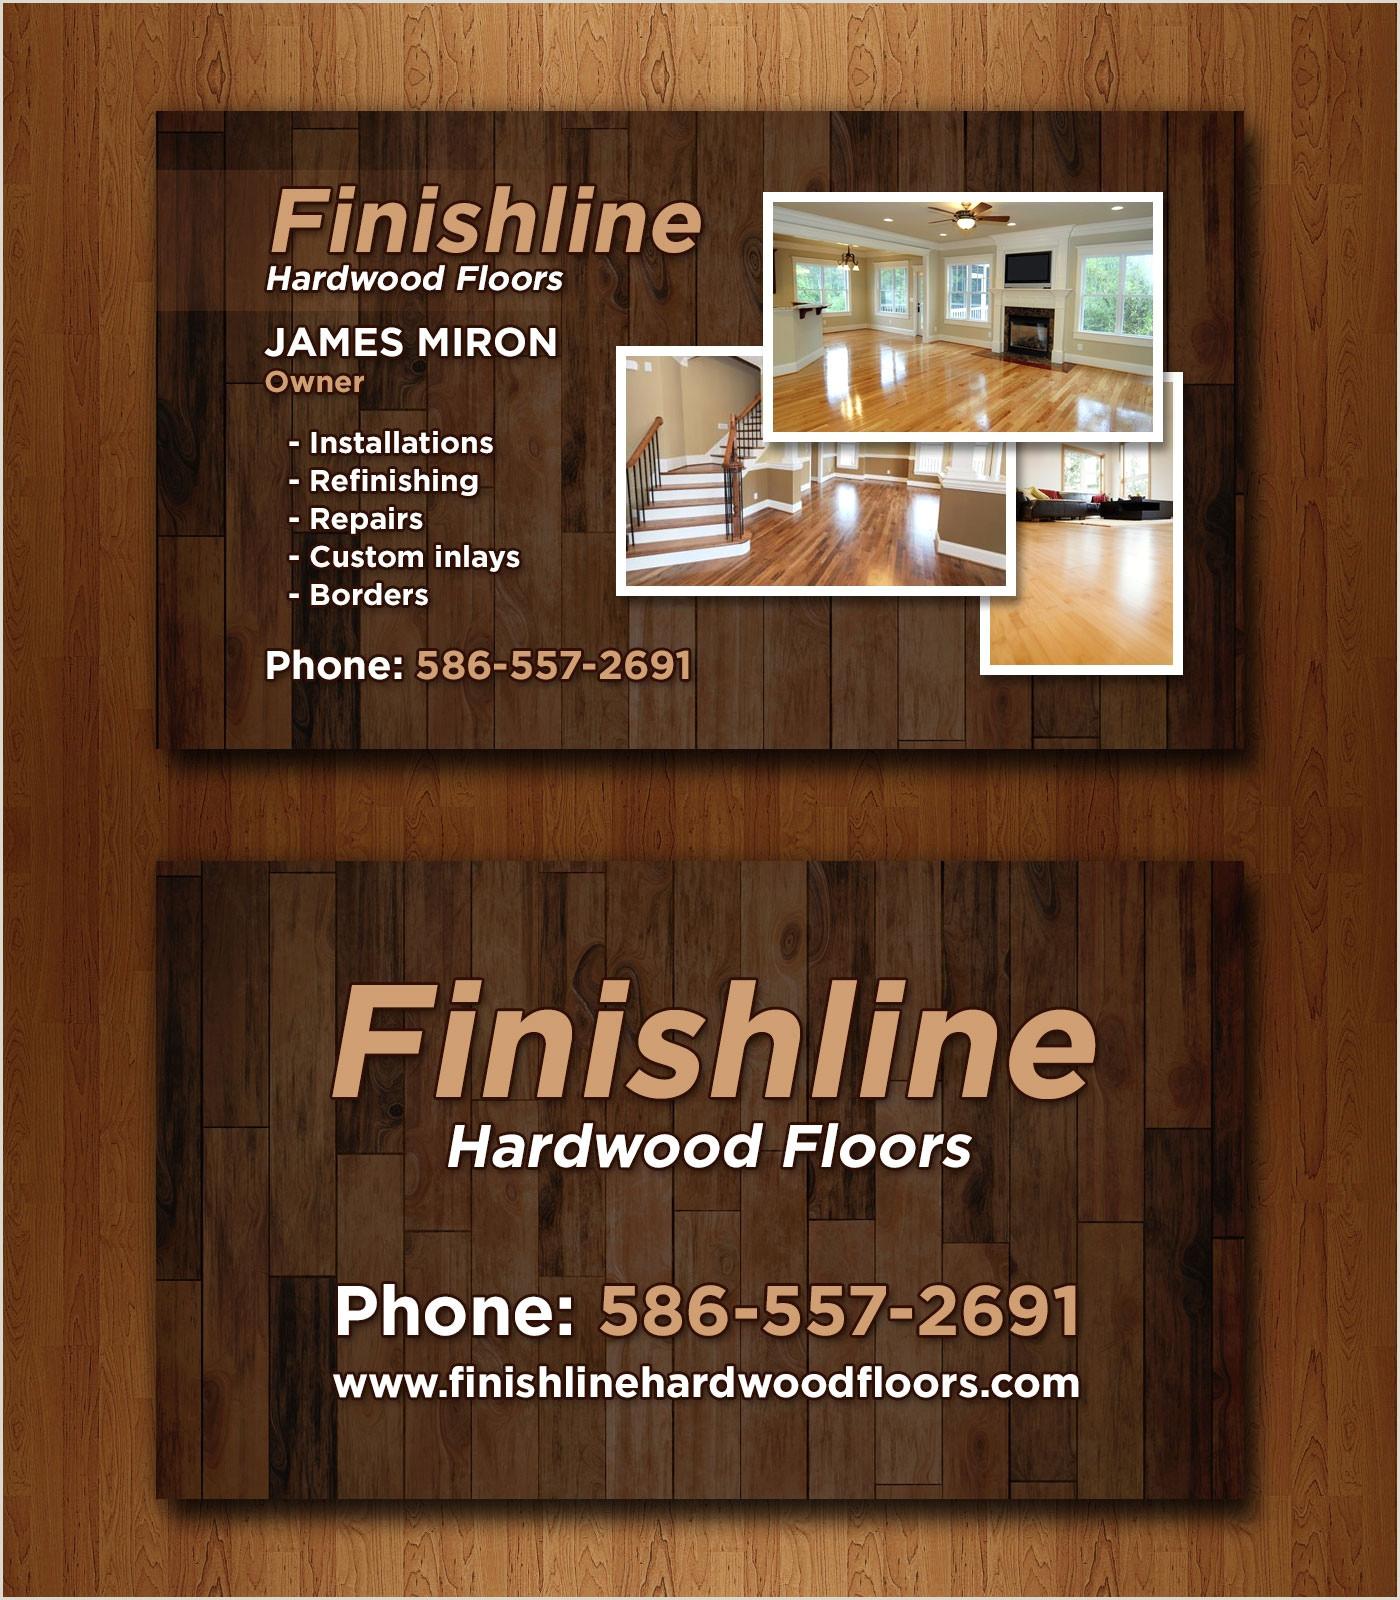 Personal Business Cards Design 14 Popular Hardwood Flooring Business Card Template